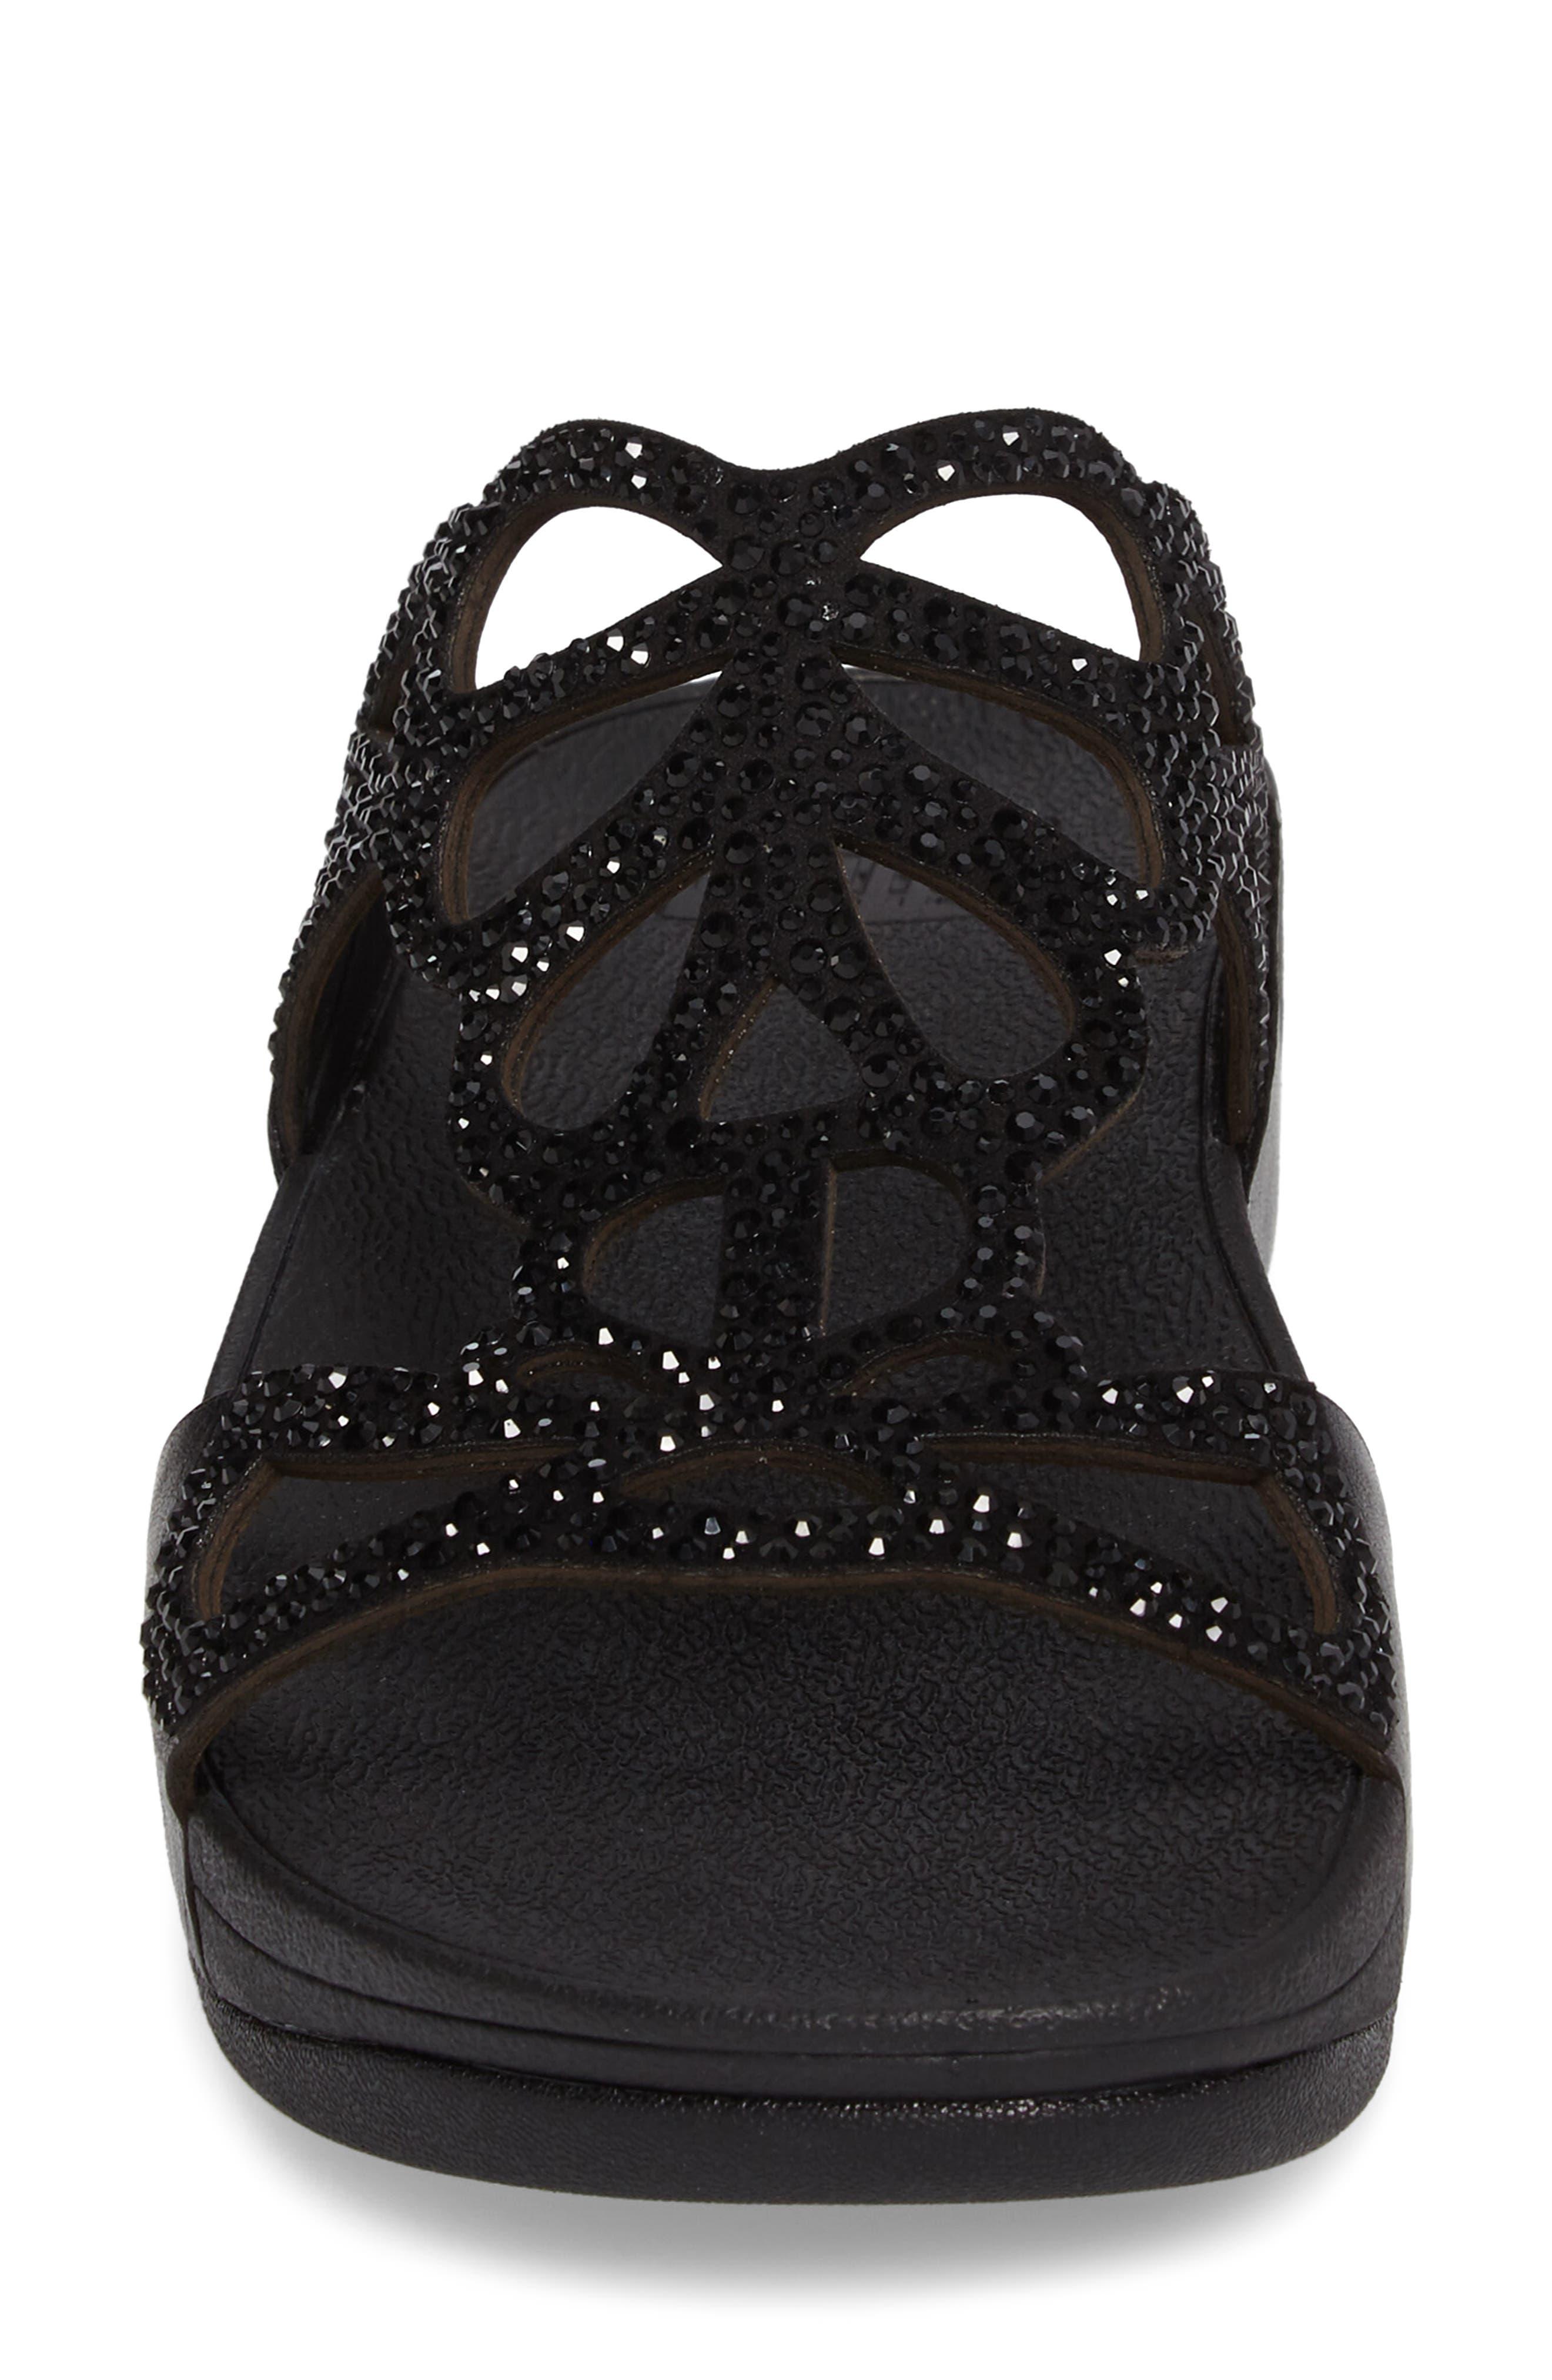 Bumble Wedge Slide Sandal,                             Alternate thumbnail 4, color,                             Black Leather